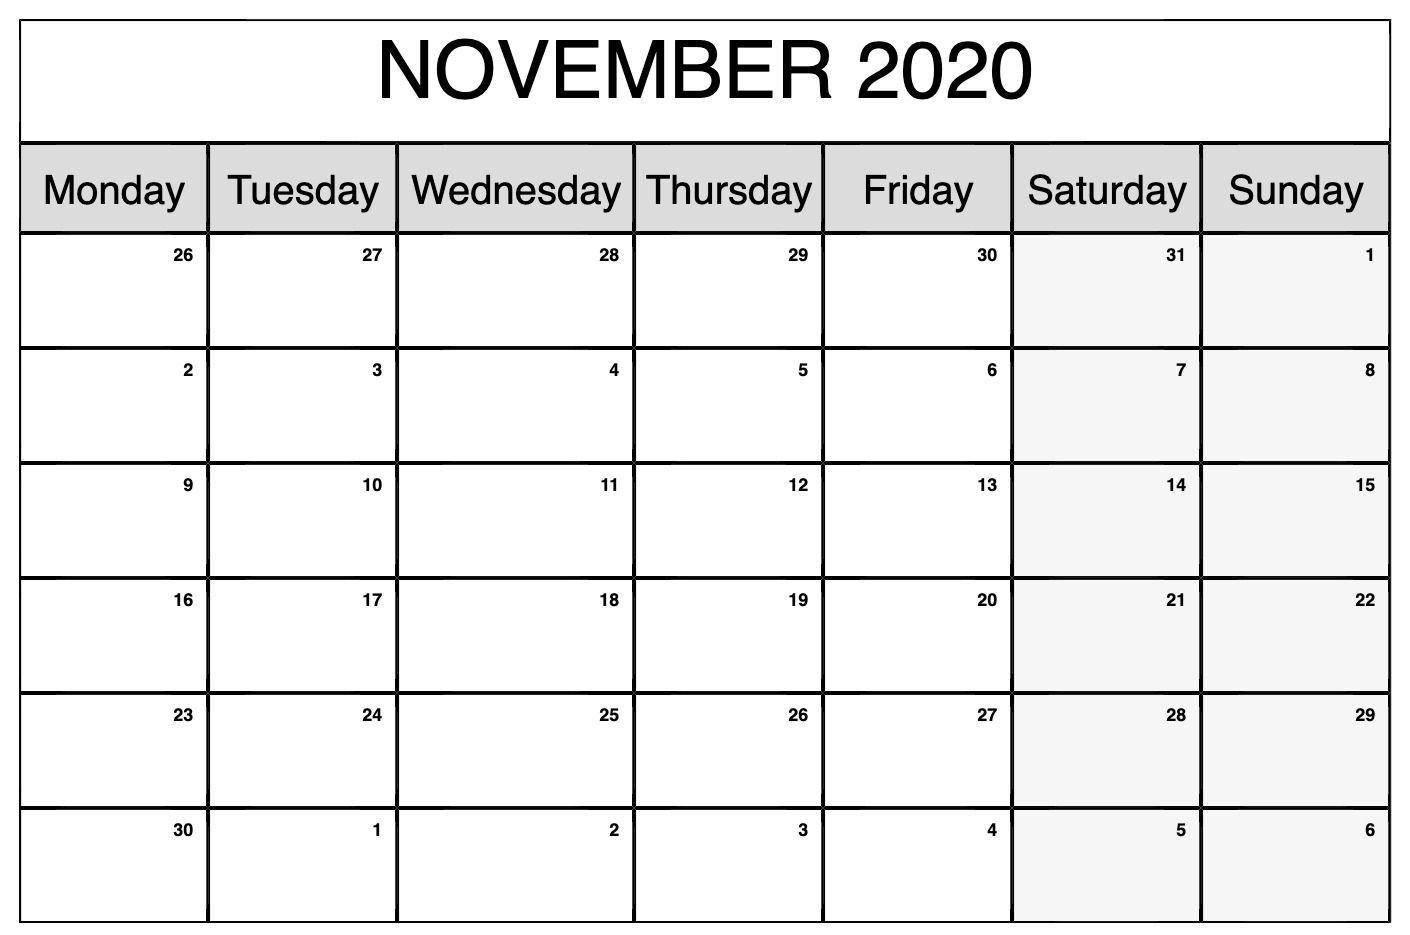 Dashing Monthly Monday To Sunday Calendars 2020 Printable